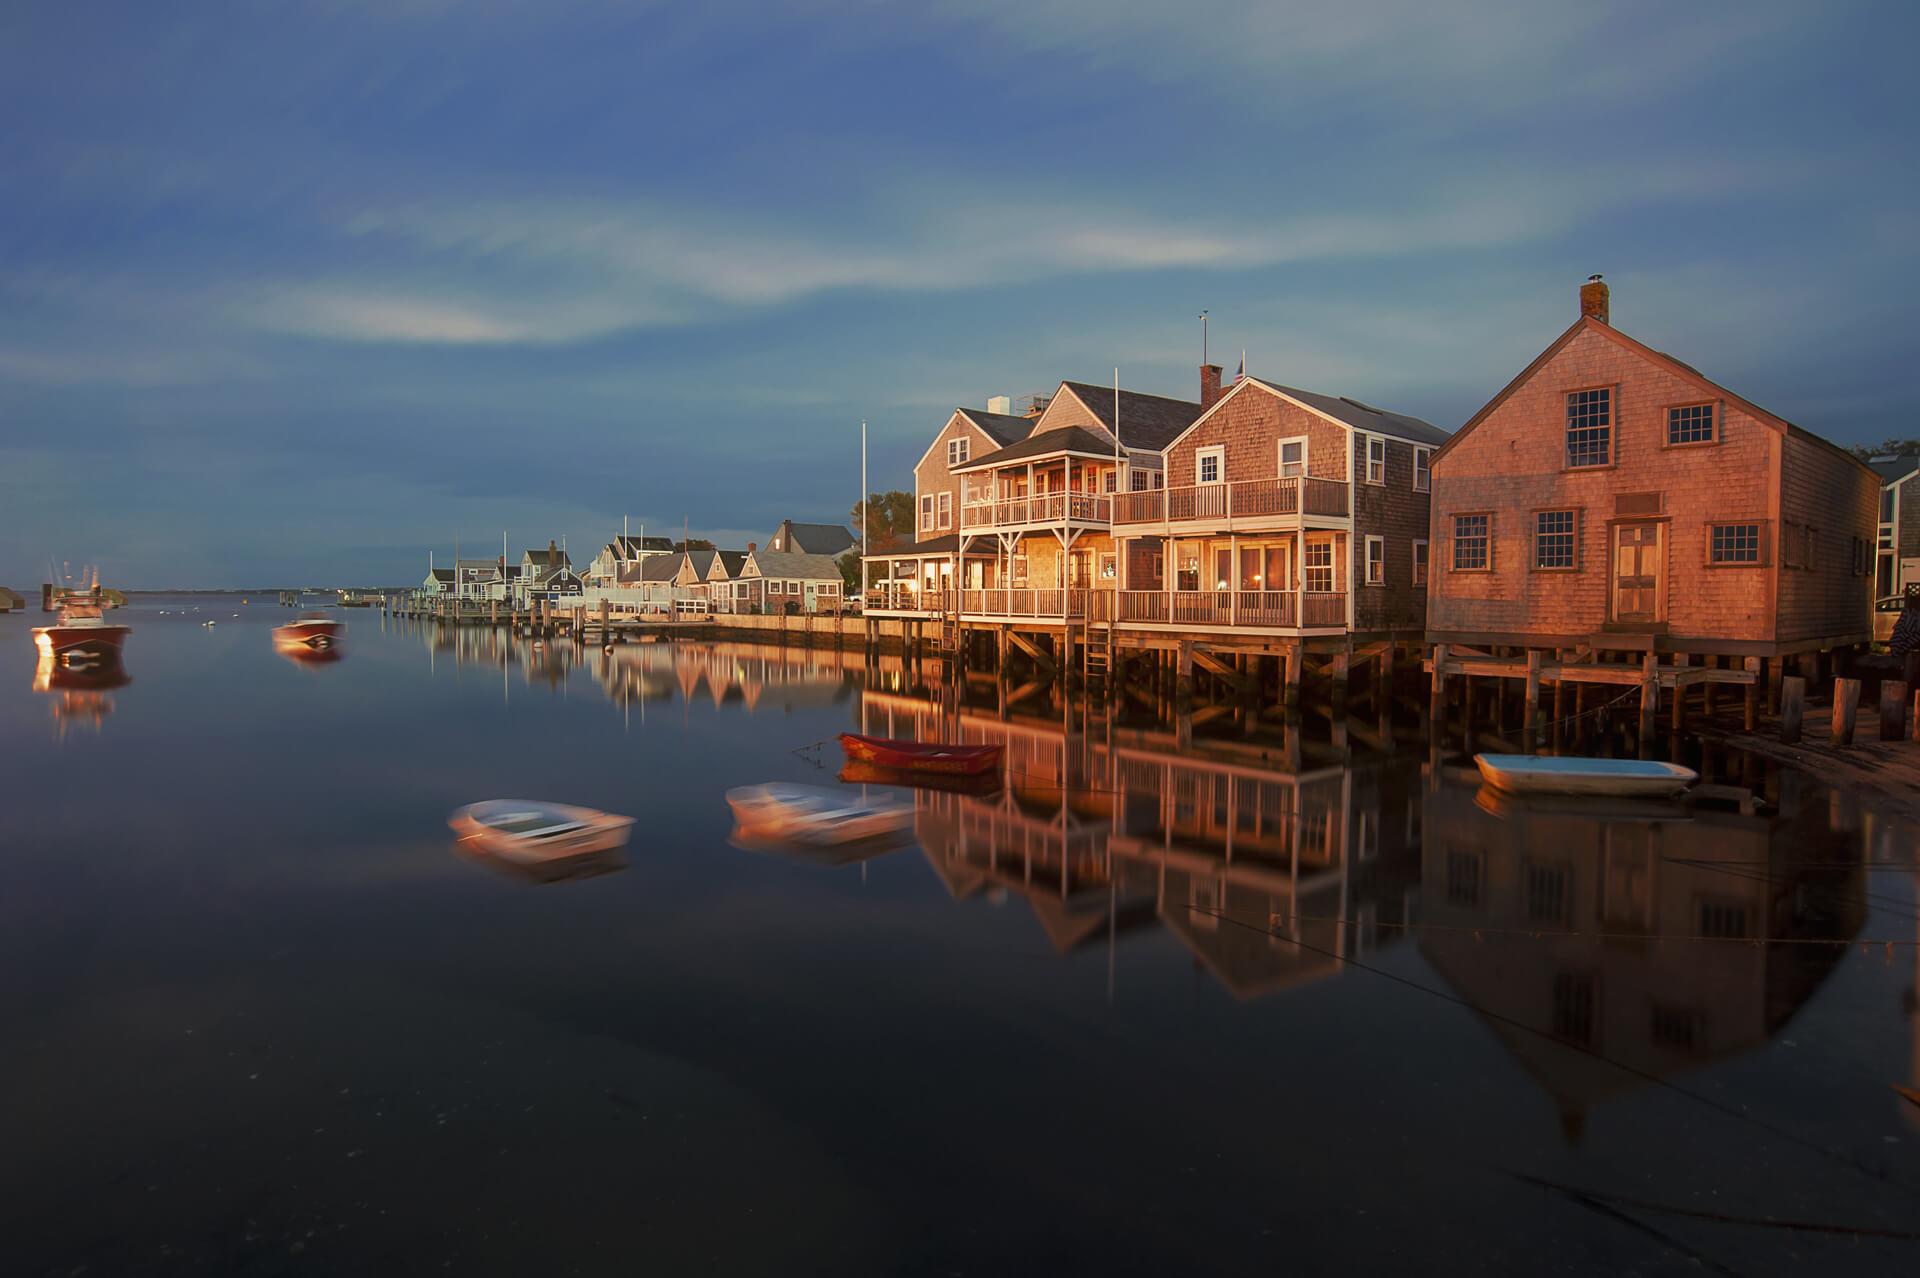 Pre-Holiday Season on Nantucket